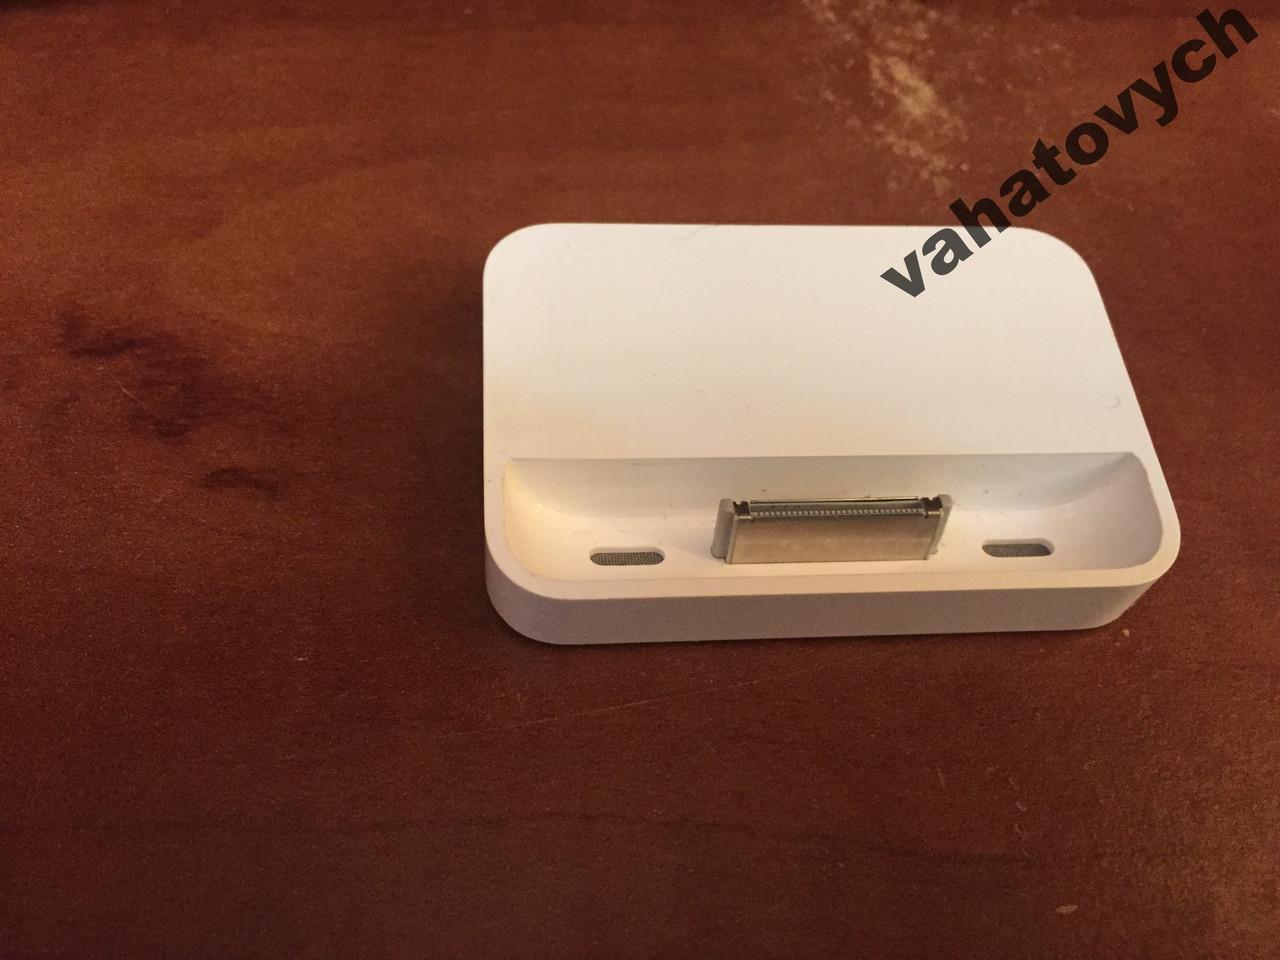 USB док станция для Apple iPhone 4  оригинал